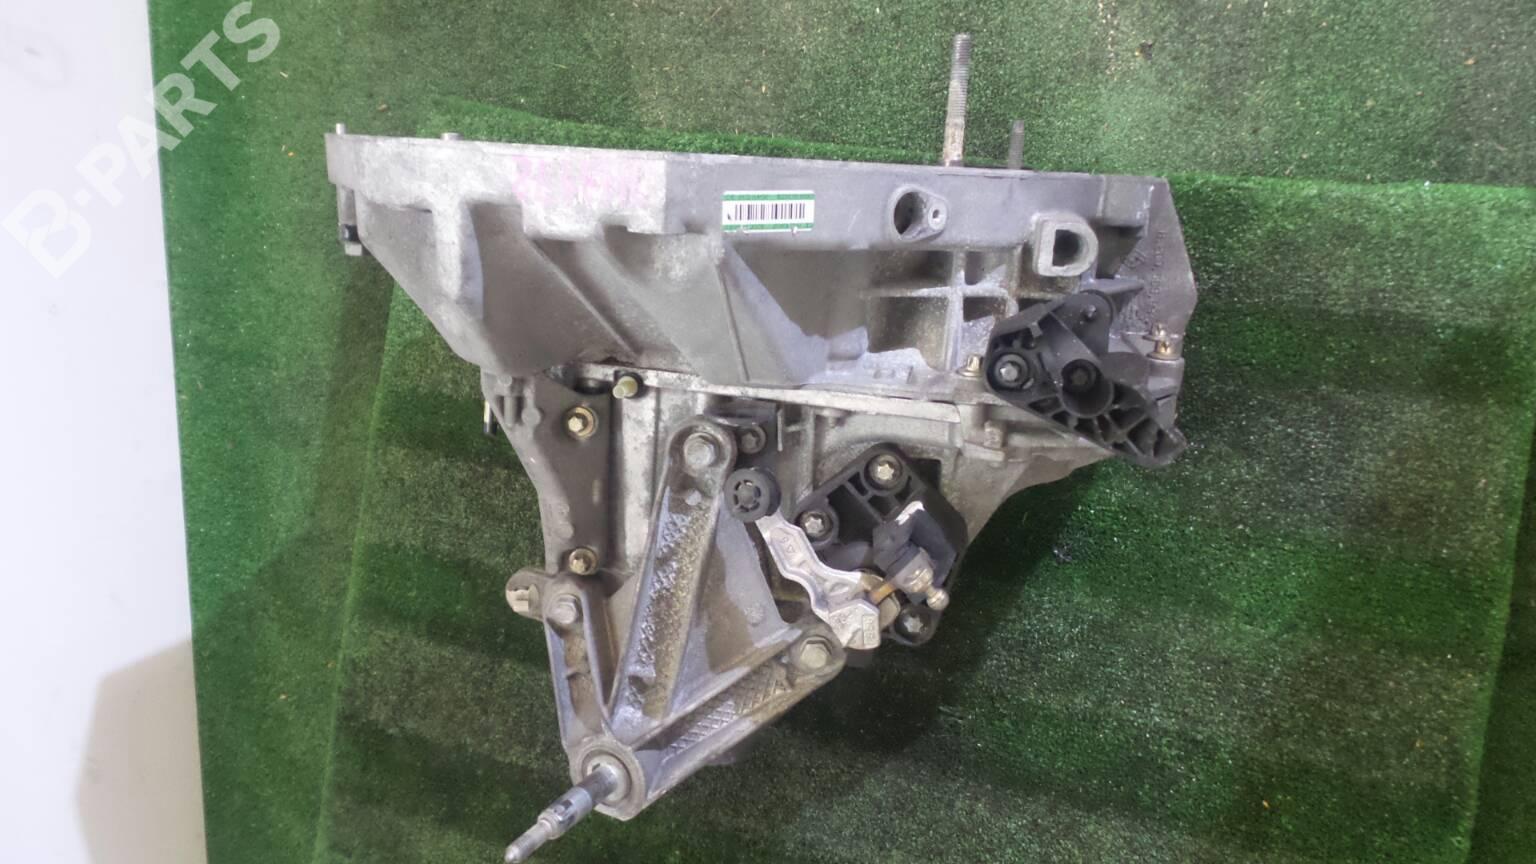 manual gearbox renault clio iii br0 1 cr0 1 1 4 16v 121100 rh b parts com Renault Clio RS Renault Clio Sport